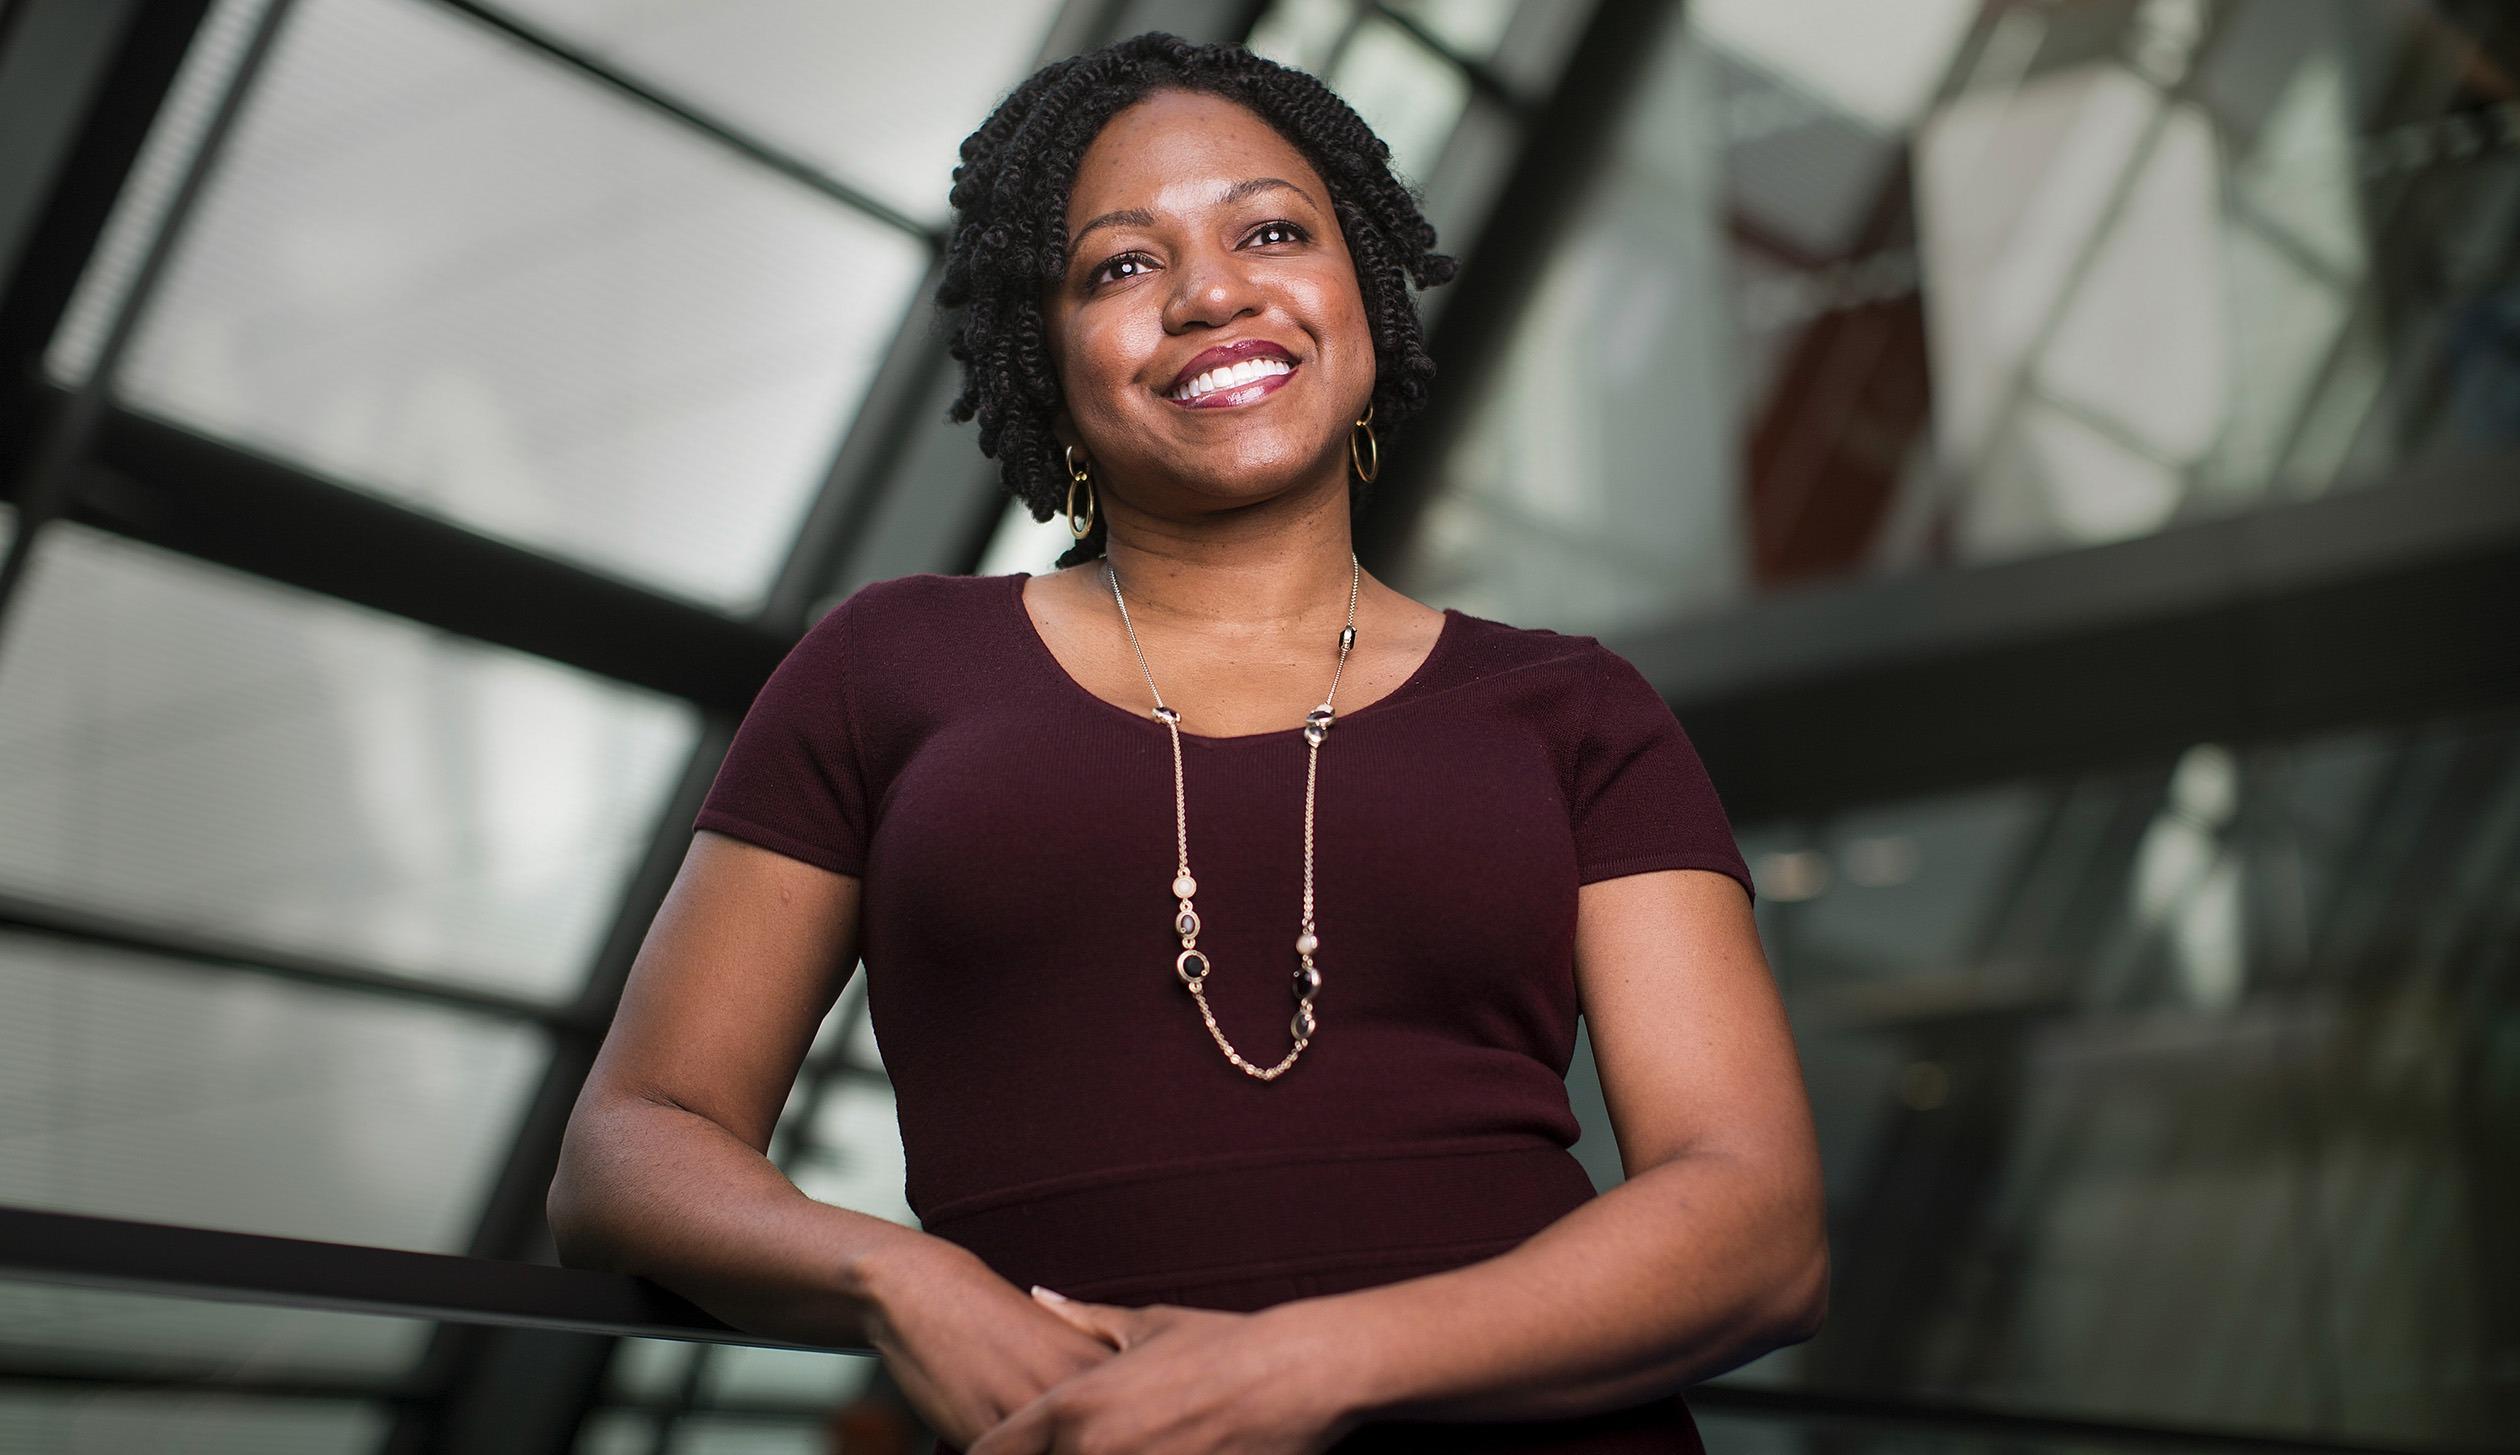 TaskRabbit Inc. Chief Operating Officer Stacy Brown-Philpot Interview